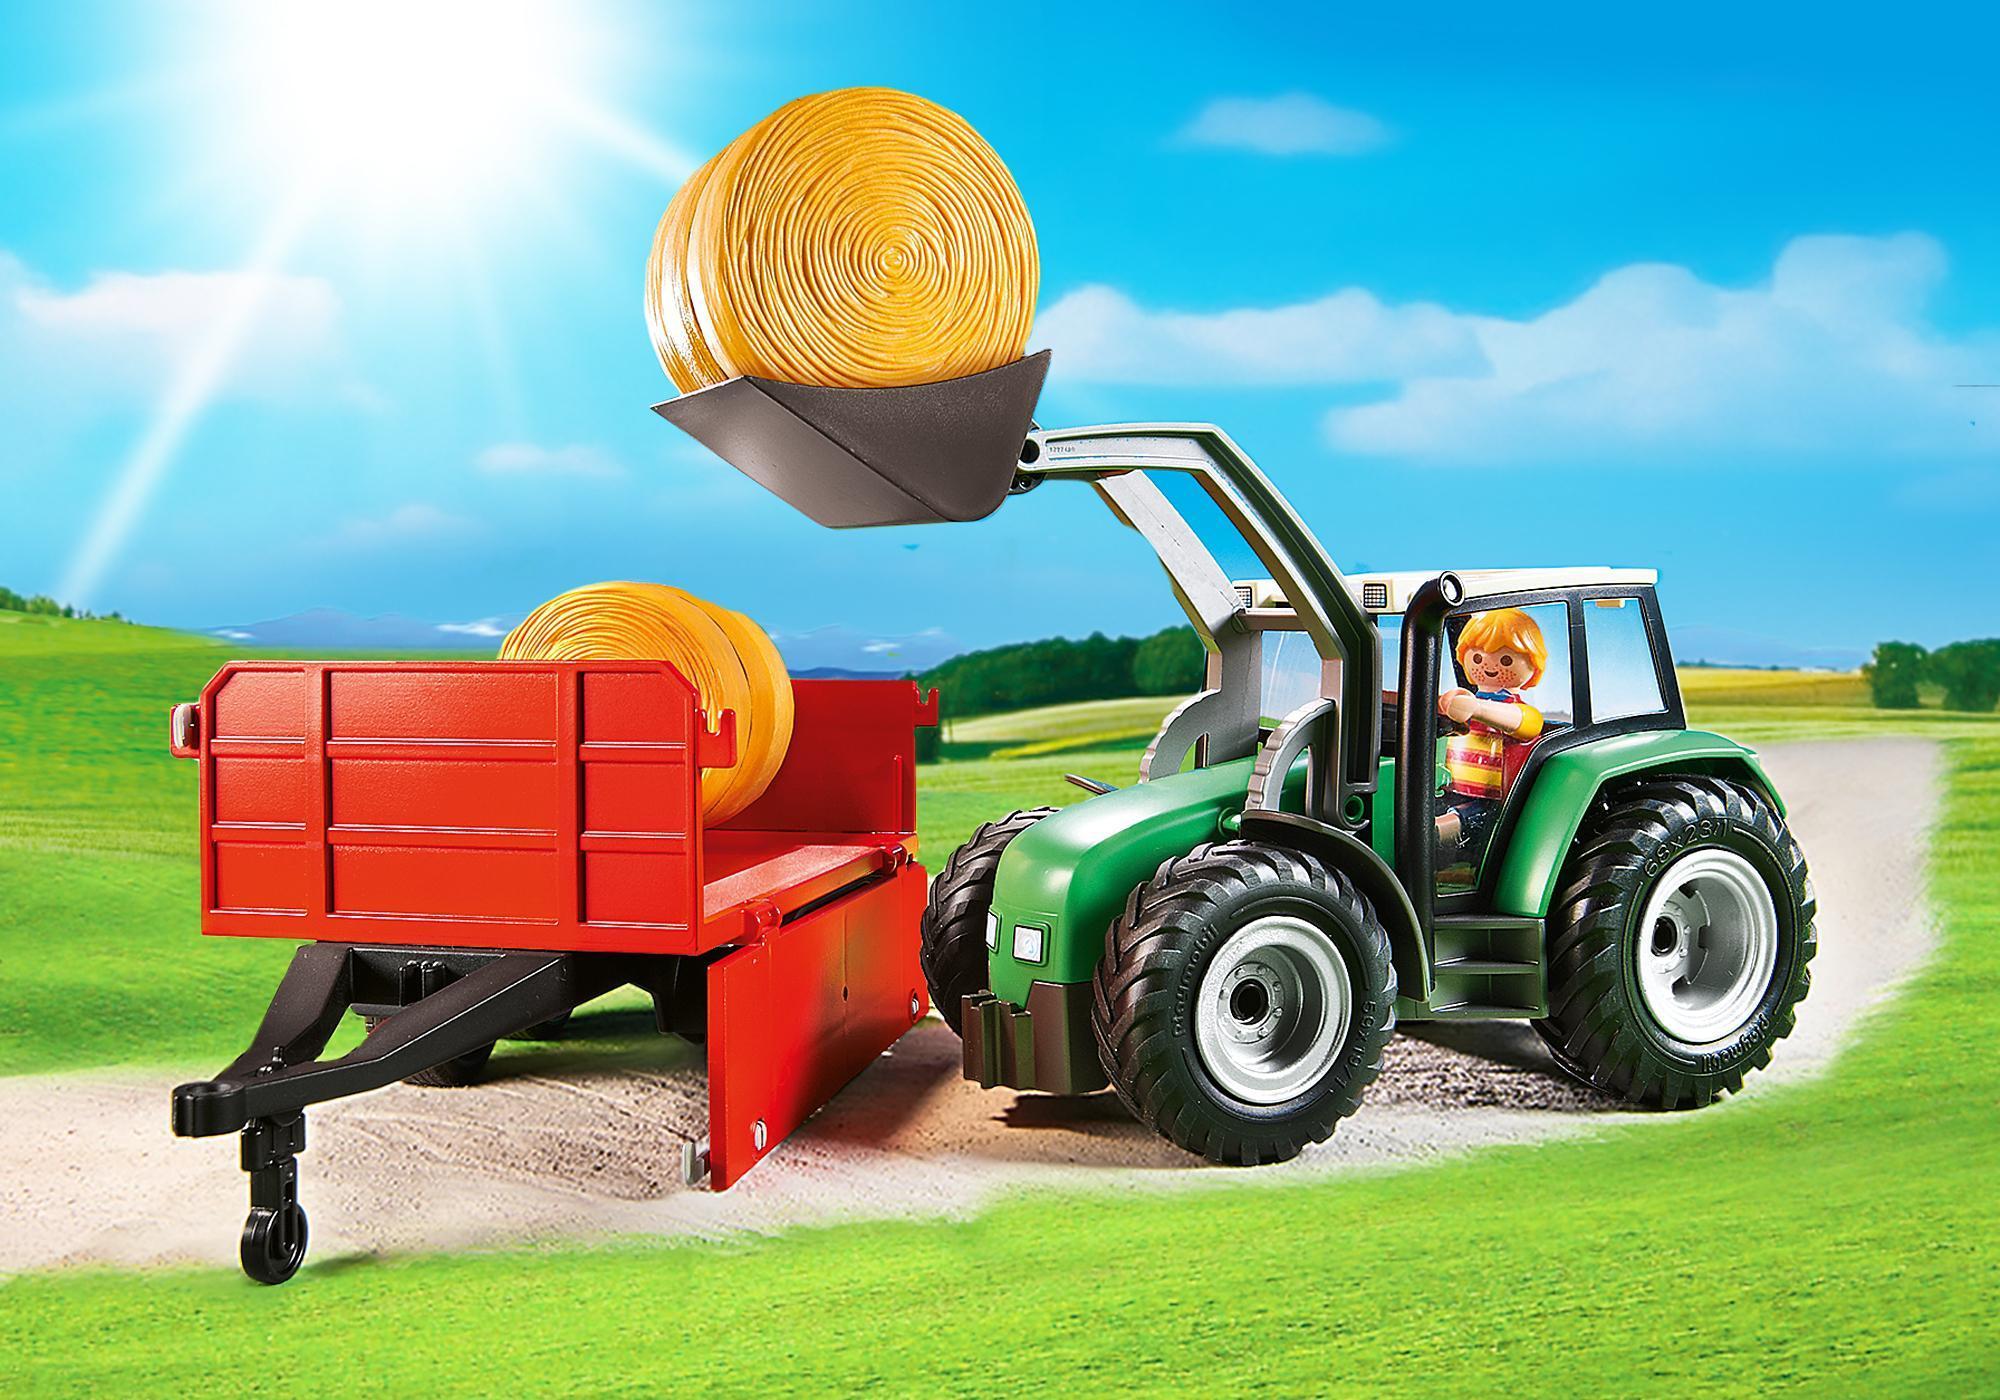 http://media.playmobil.com/i/playmobil/6130_product_extra3/Μεγάλο τρακτέρ με καρότσα